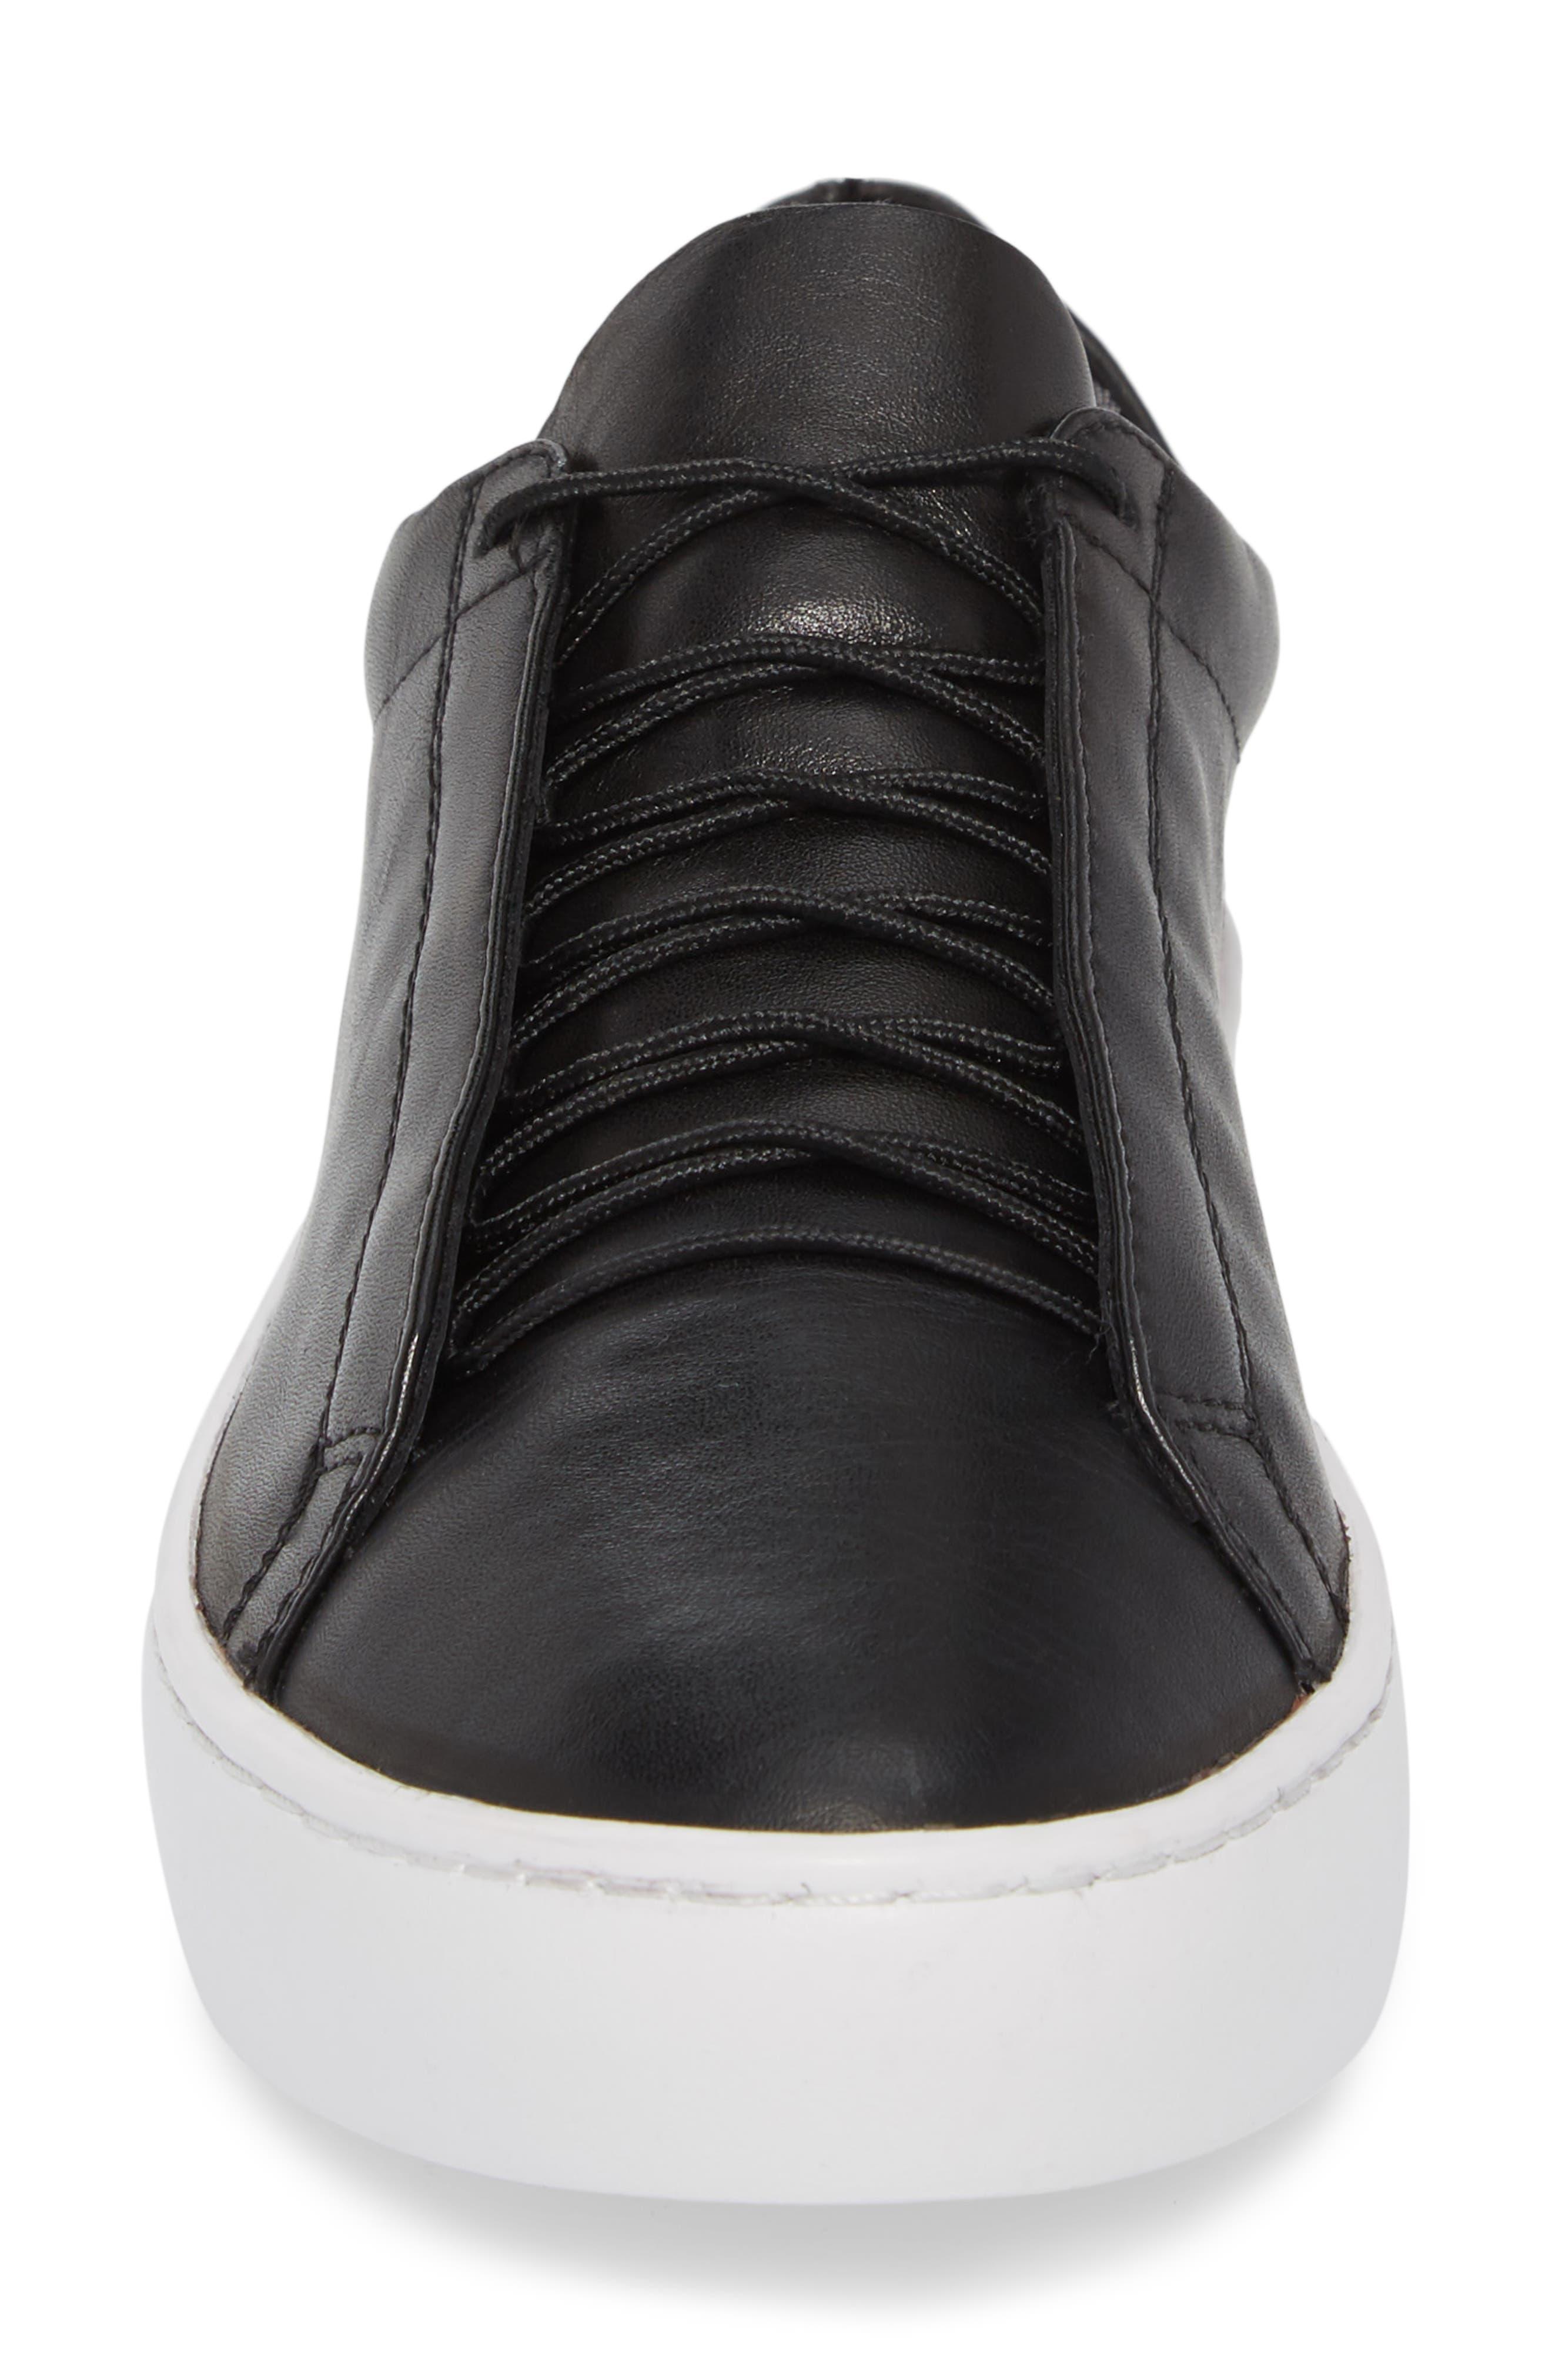 Zoe Sneaker,                             Alternate thumbnail 4, color,                             BLACK LEATHER